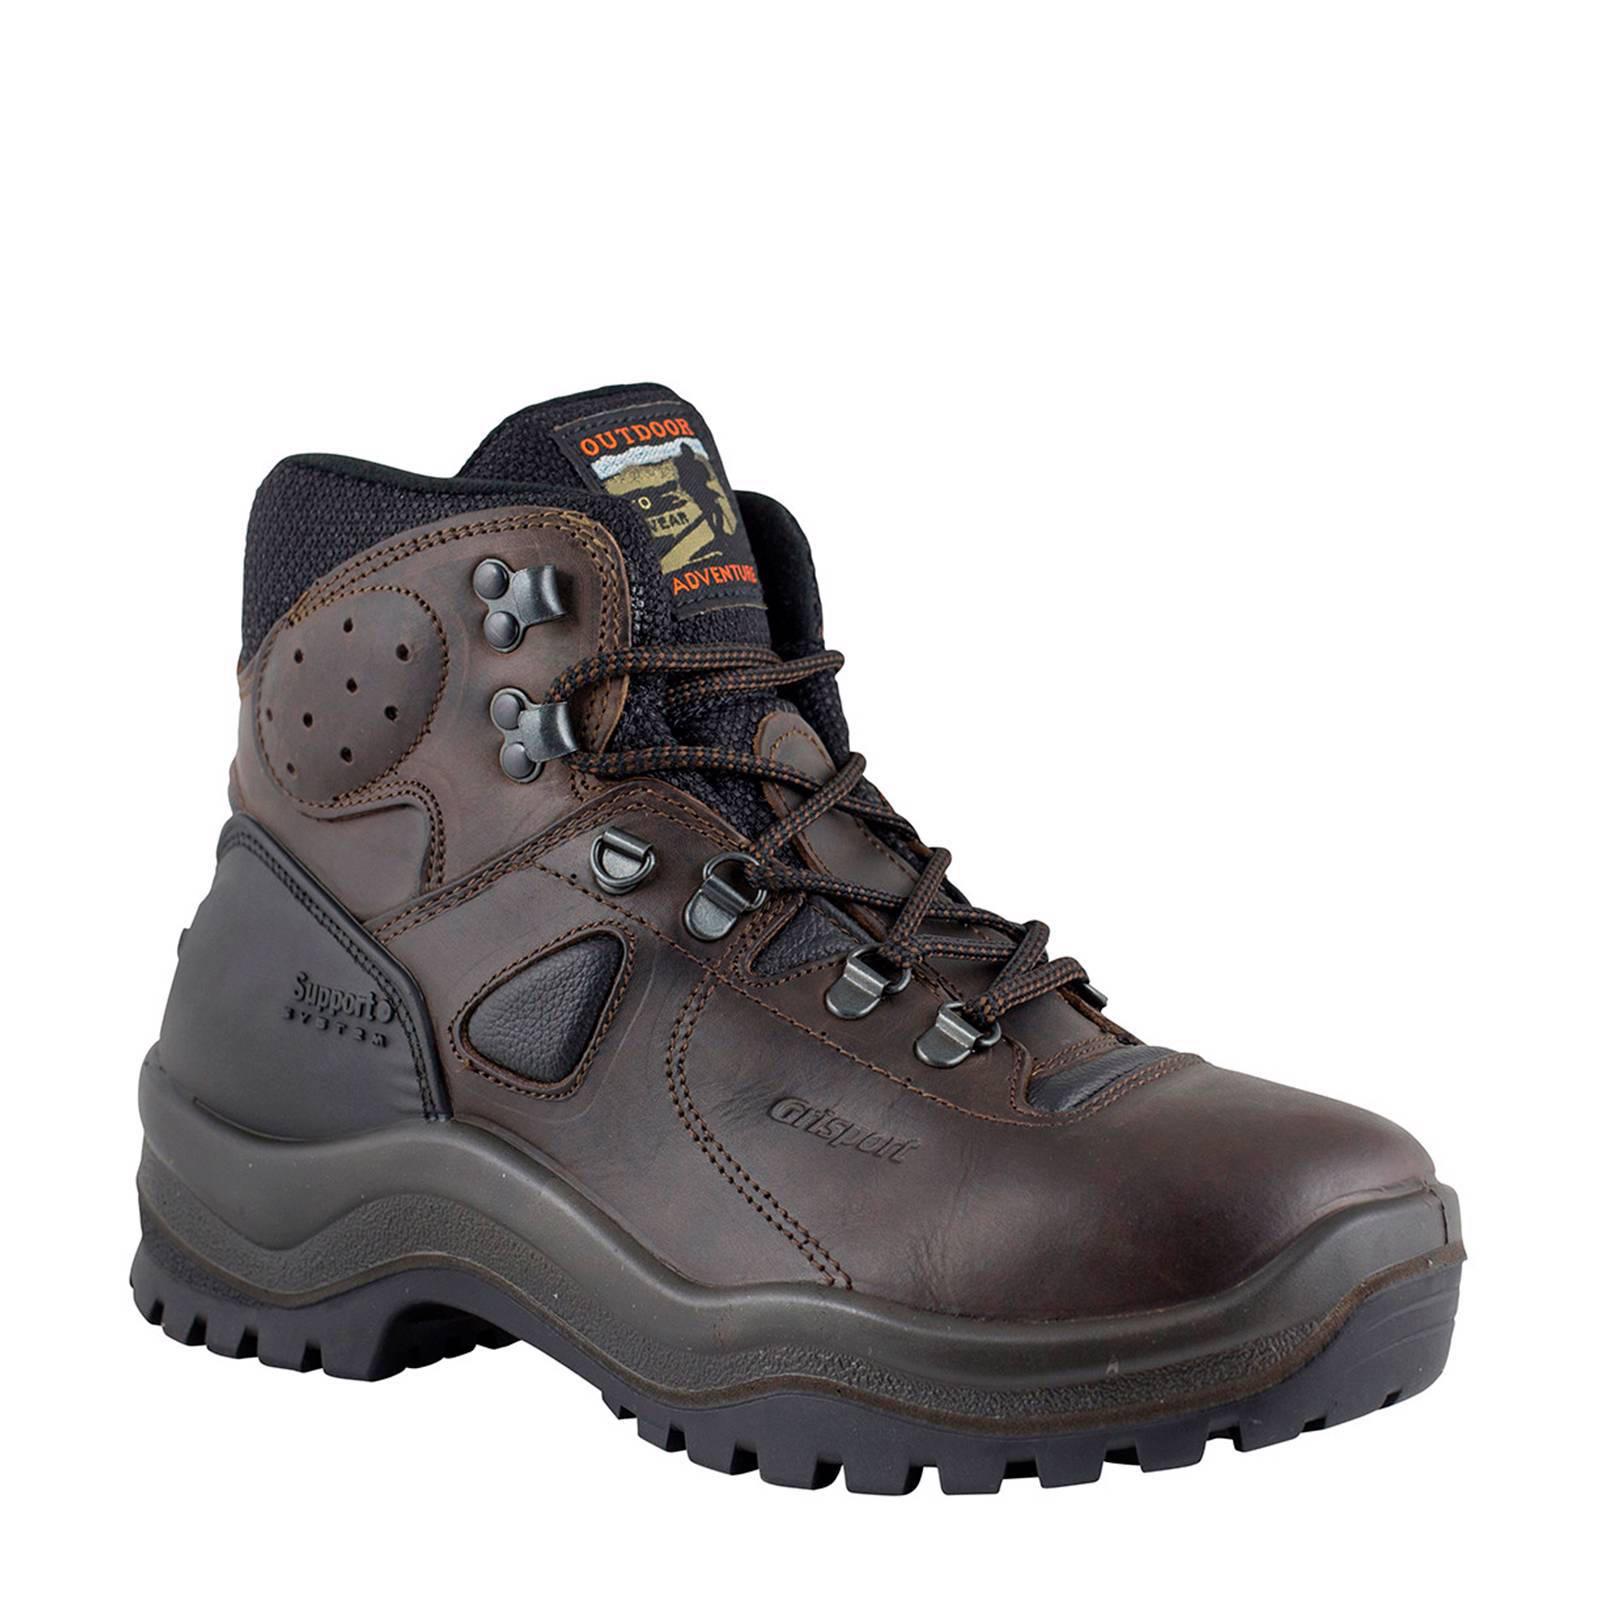 e793e985be0 Grisport wandelschoenen Sherpa | wehkamp